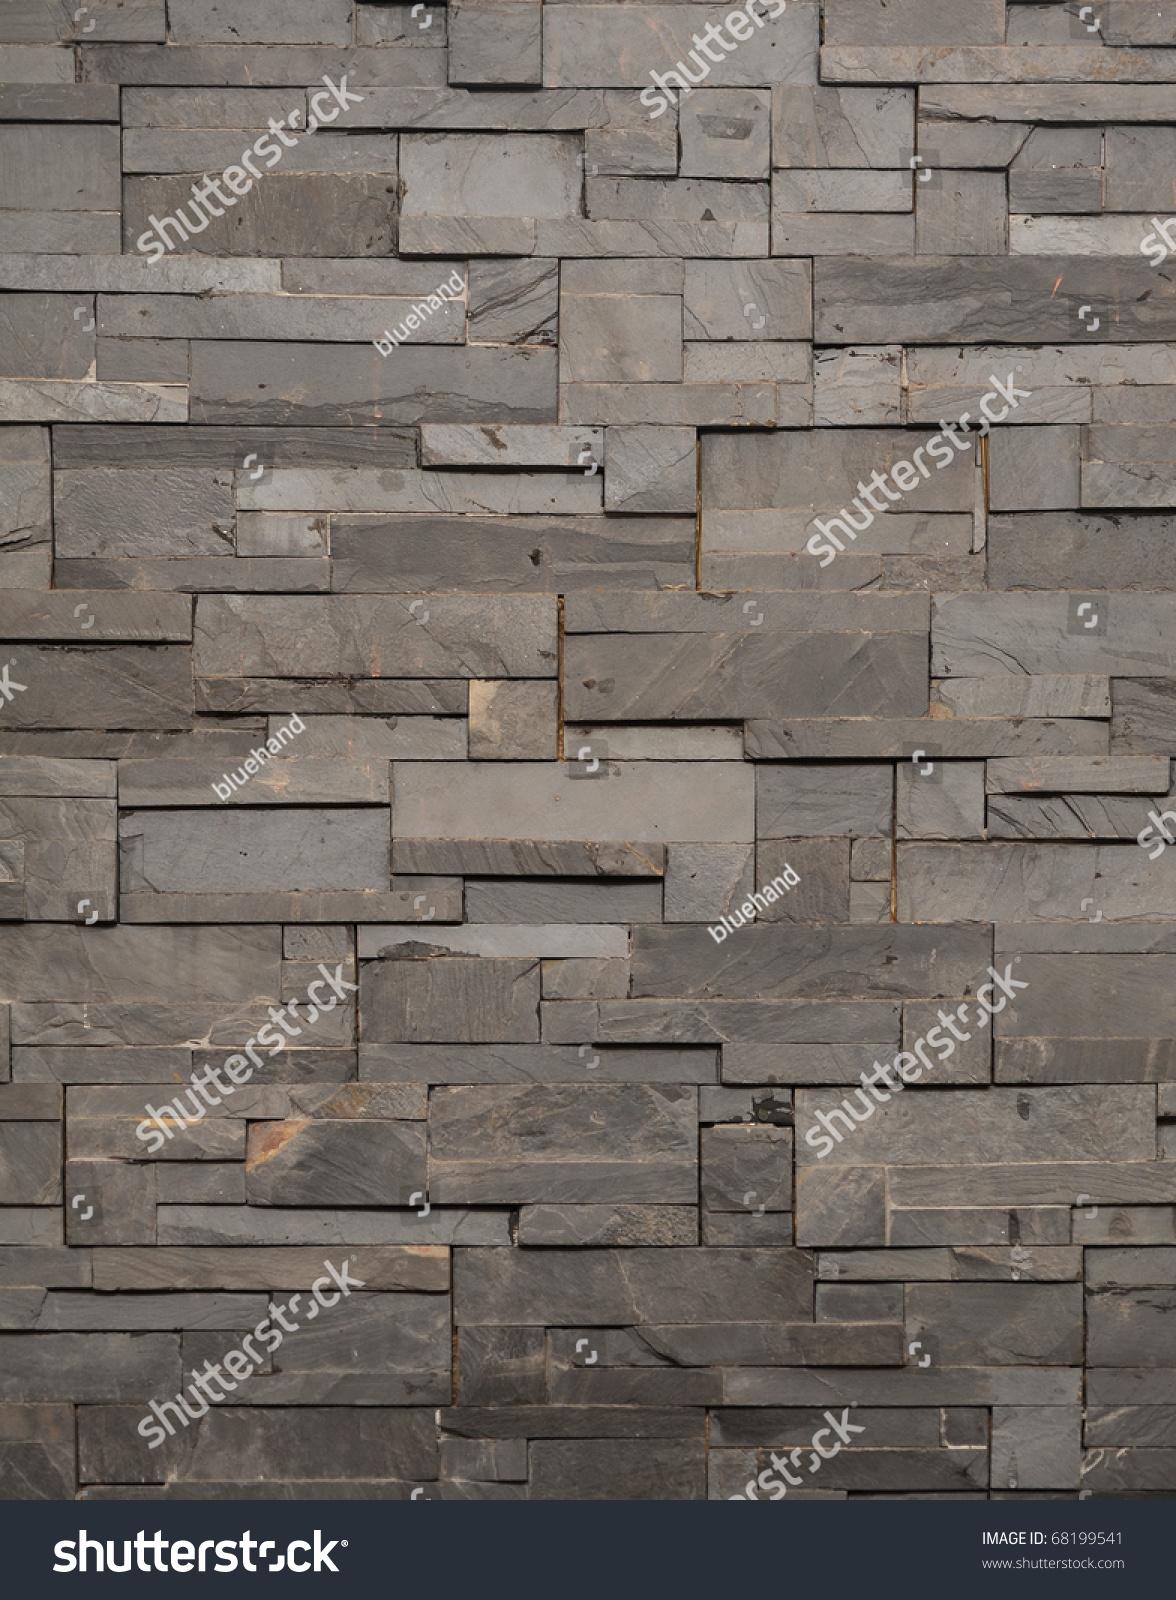 dark stone tile texture. dark grey stone tile texture brick wall surfaced Dark Grey Stone Tile Texture Brick Stock Photo 68199541  Shutterstock